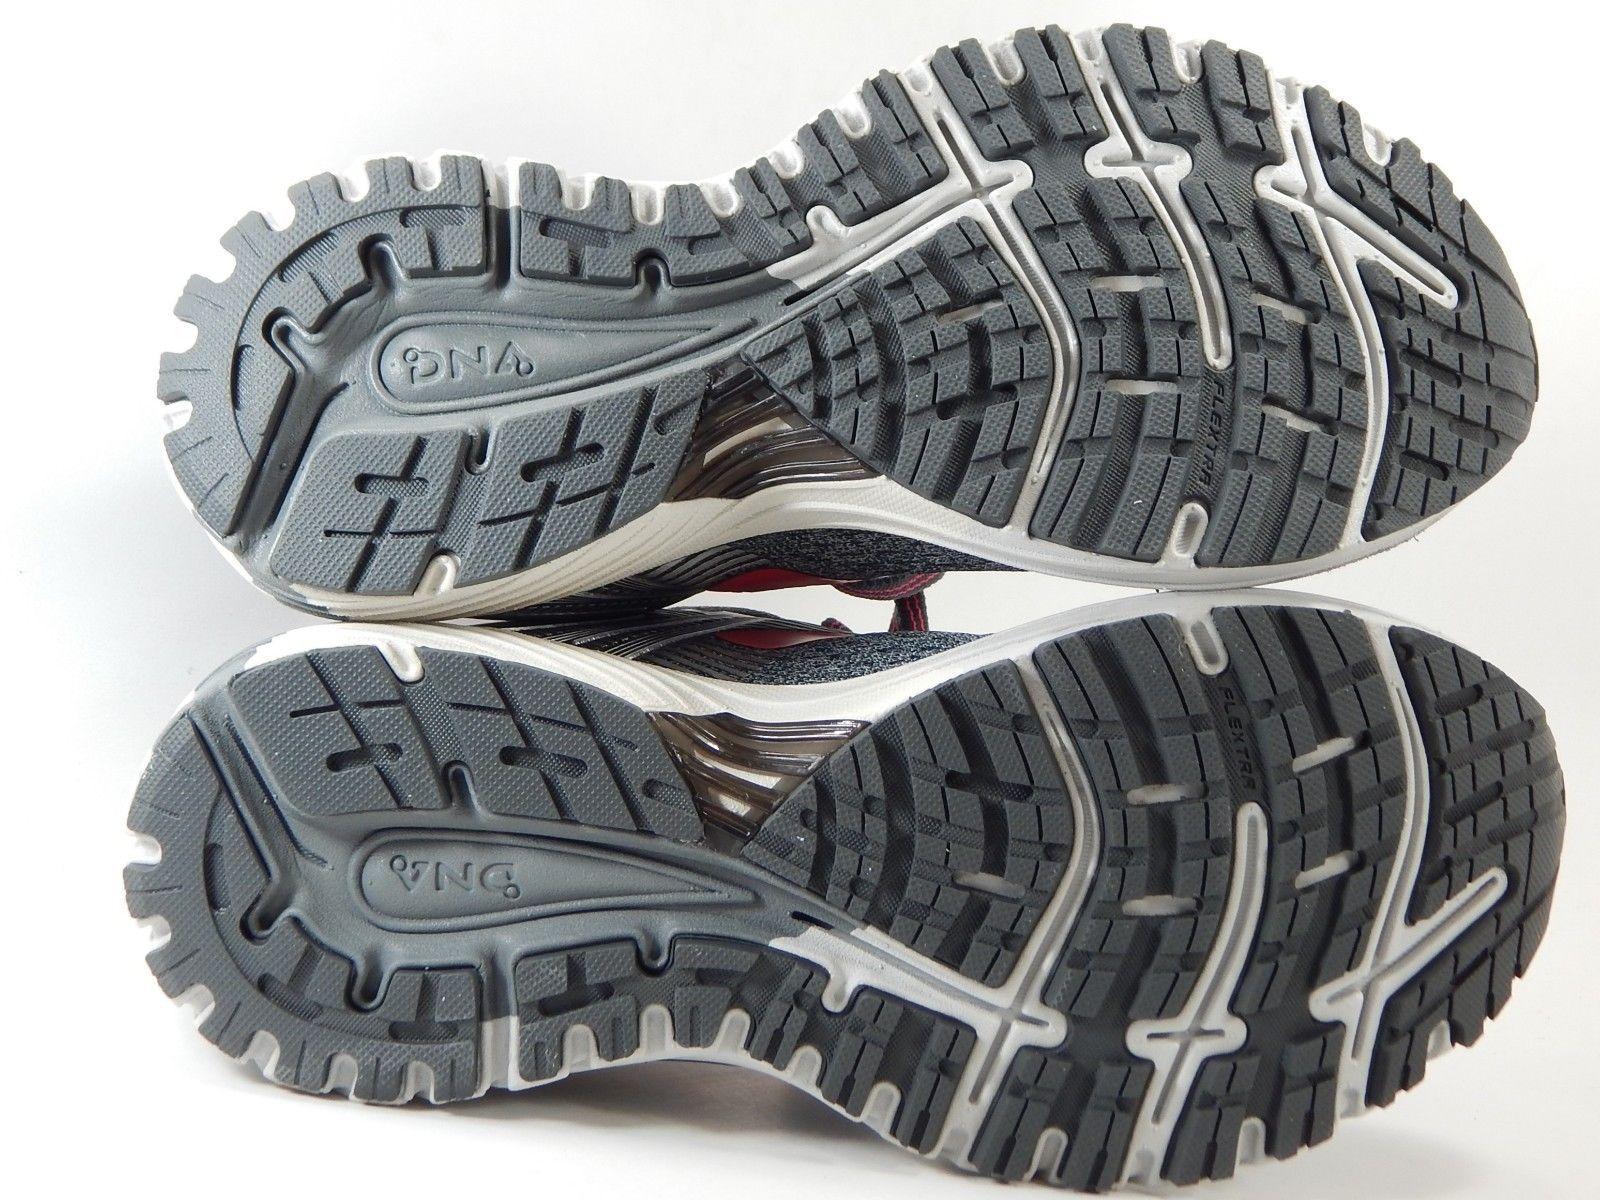 2e9e333e05ffe MISMATCH Brooks GTS 18 Size 7 M (B) Left   and 24 similar items